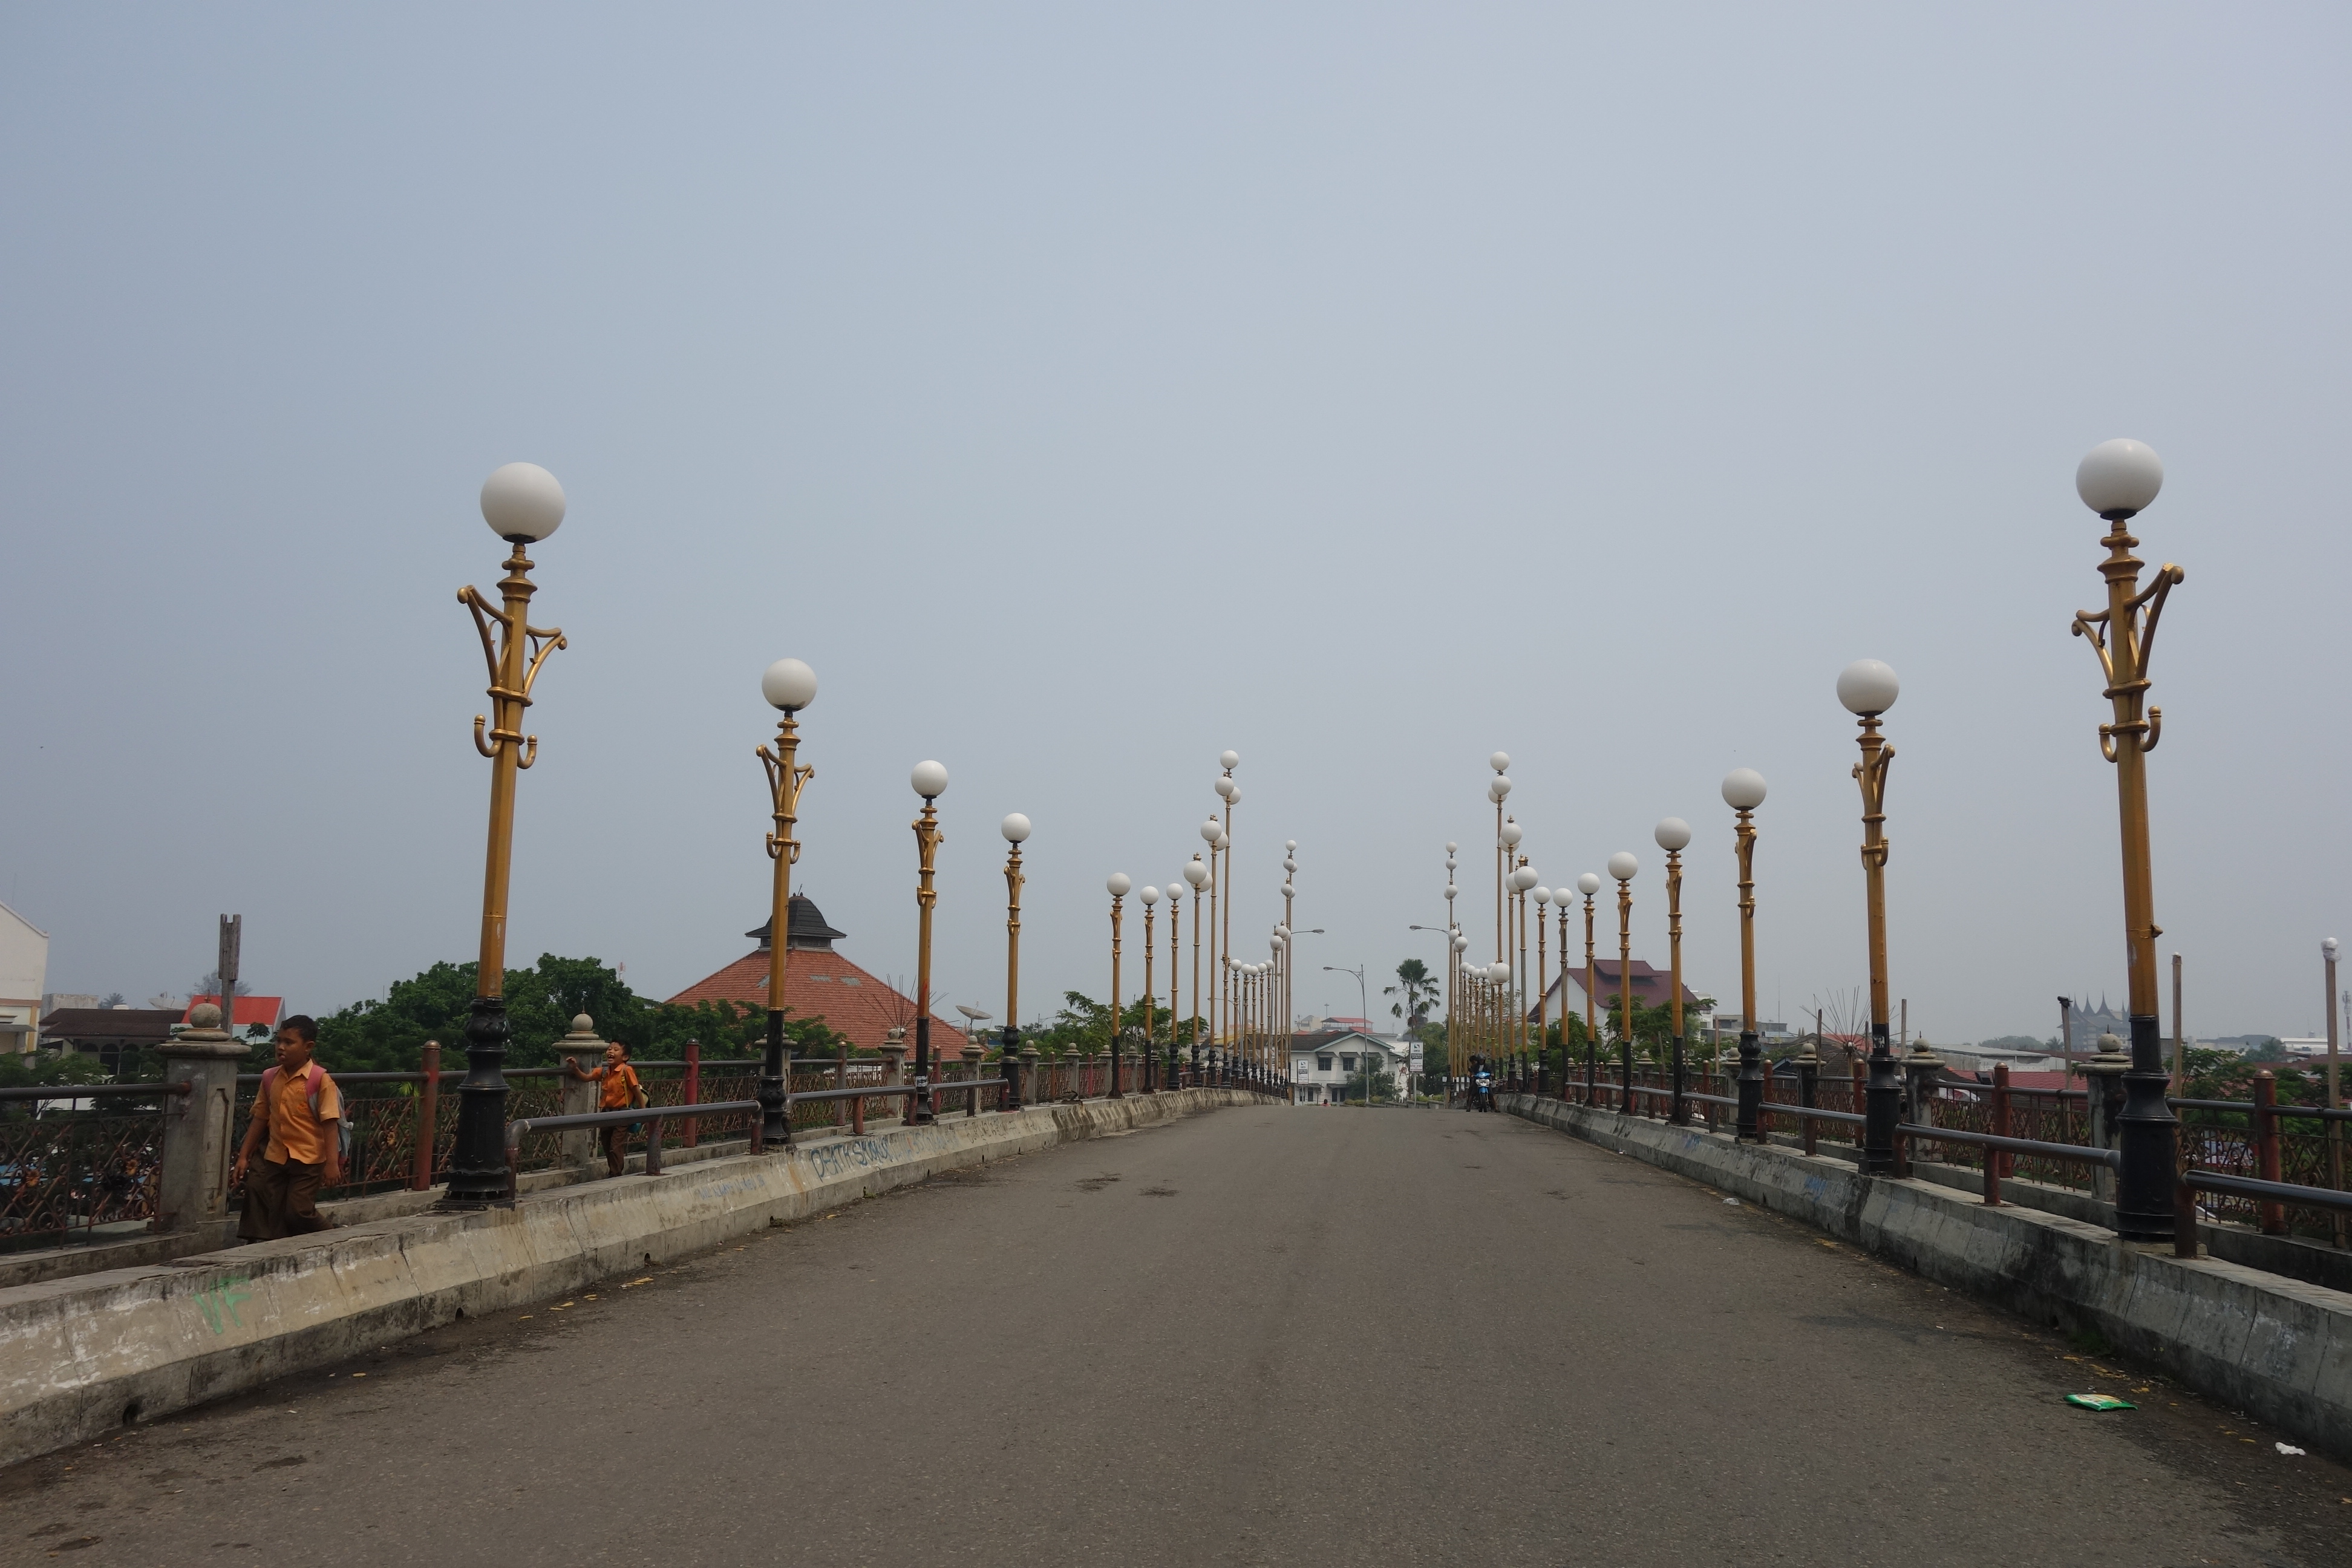 Jelajahi Selama Kota Padang Atas Jembata Siti Nurbaya Jembatan